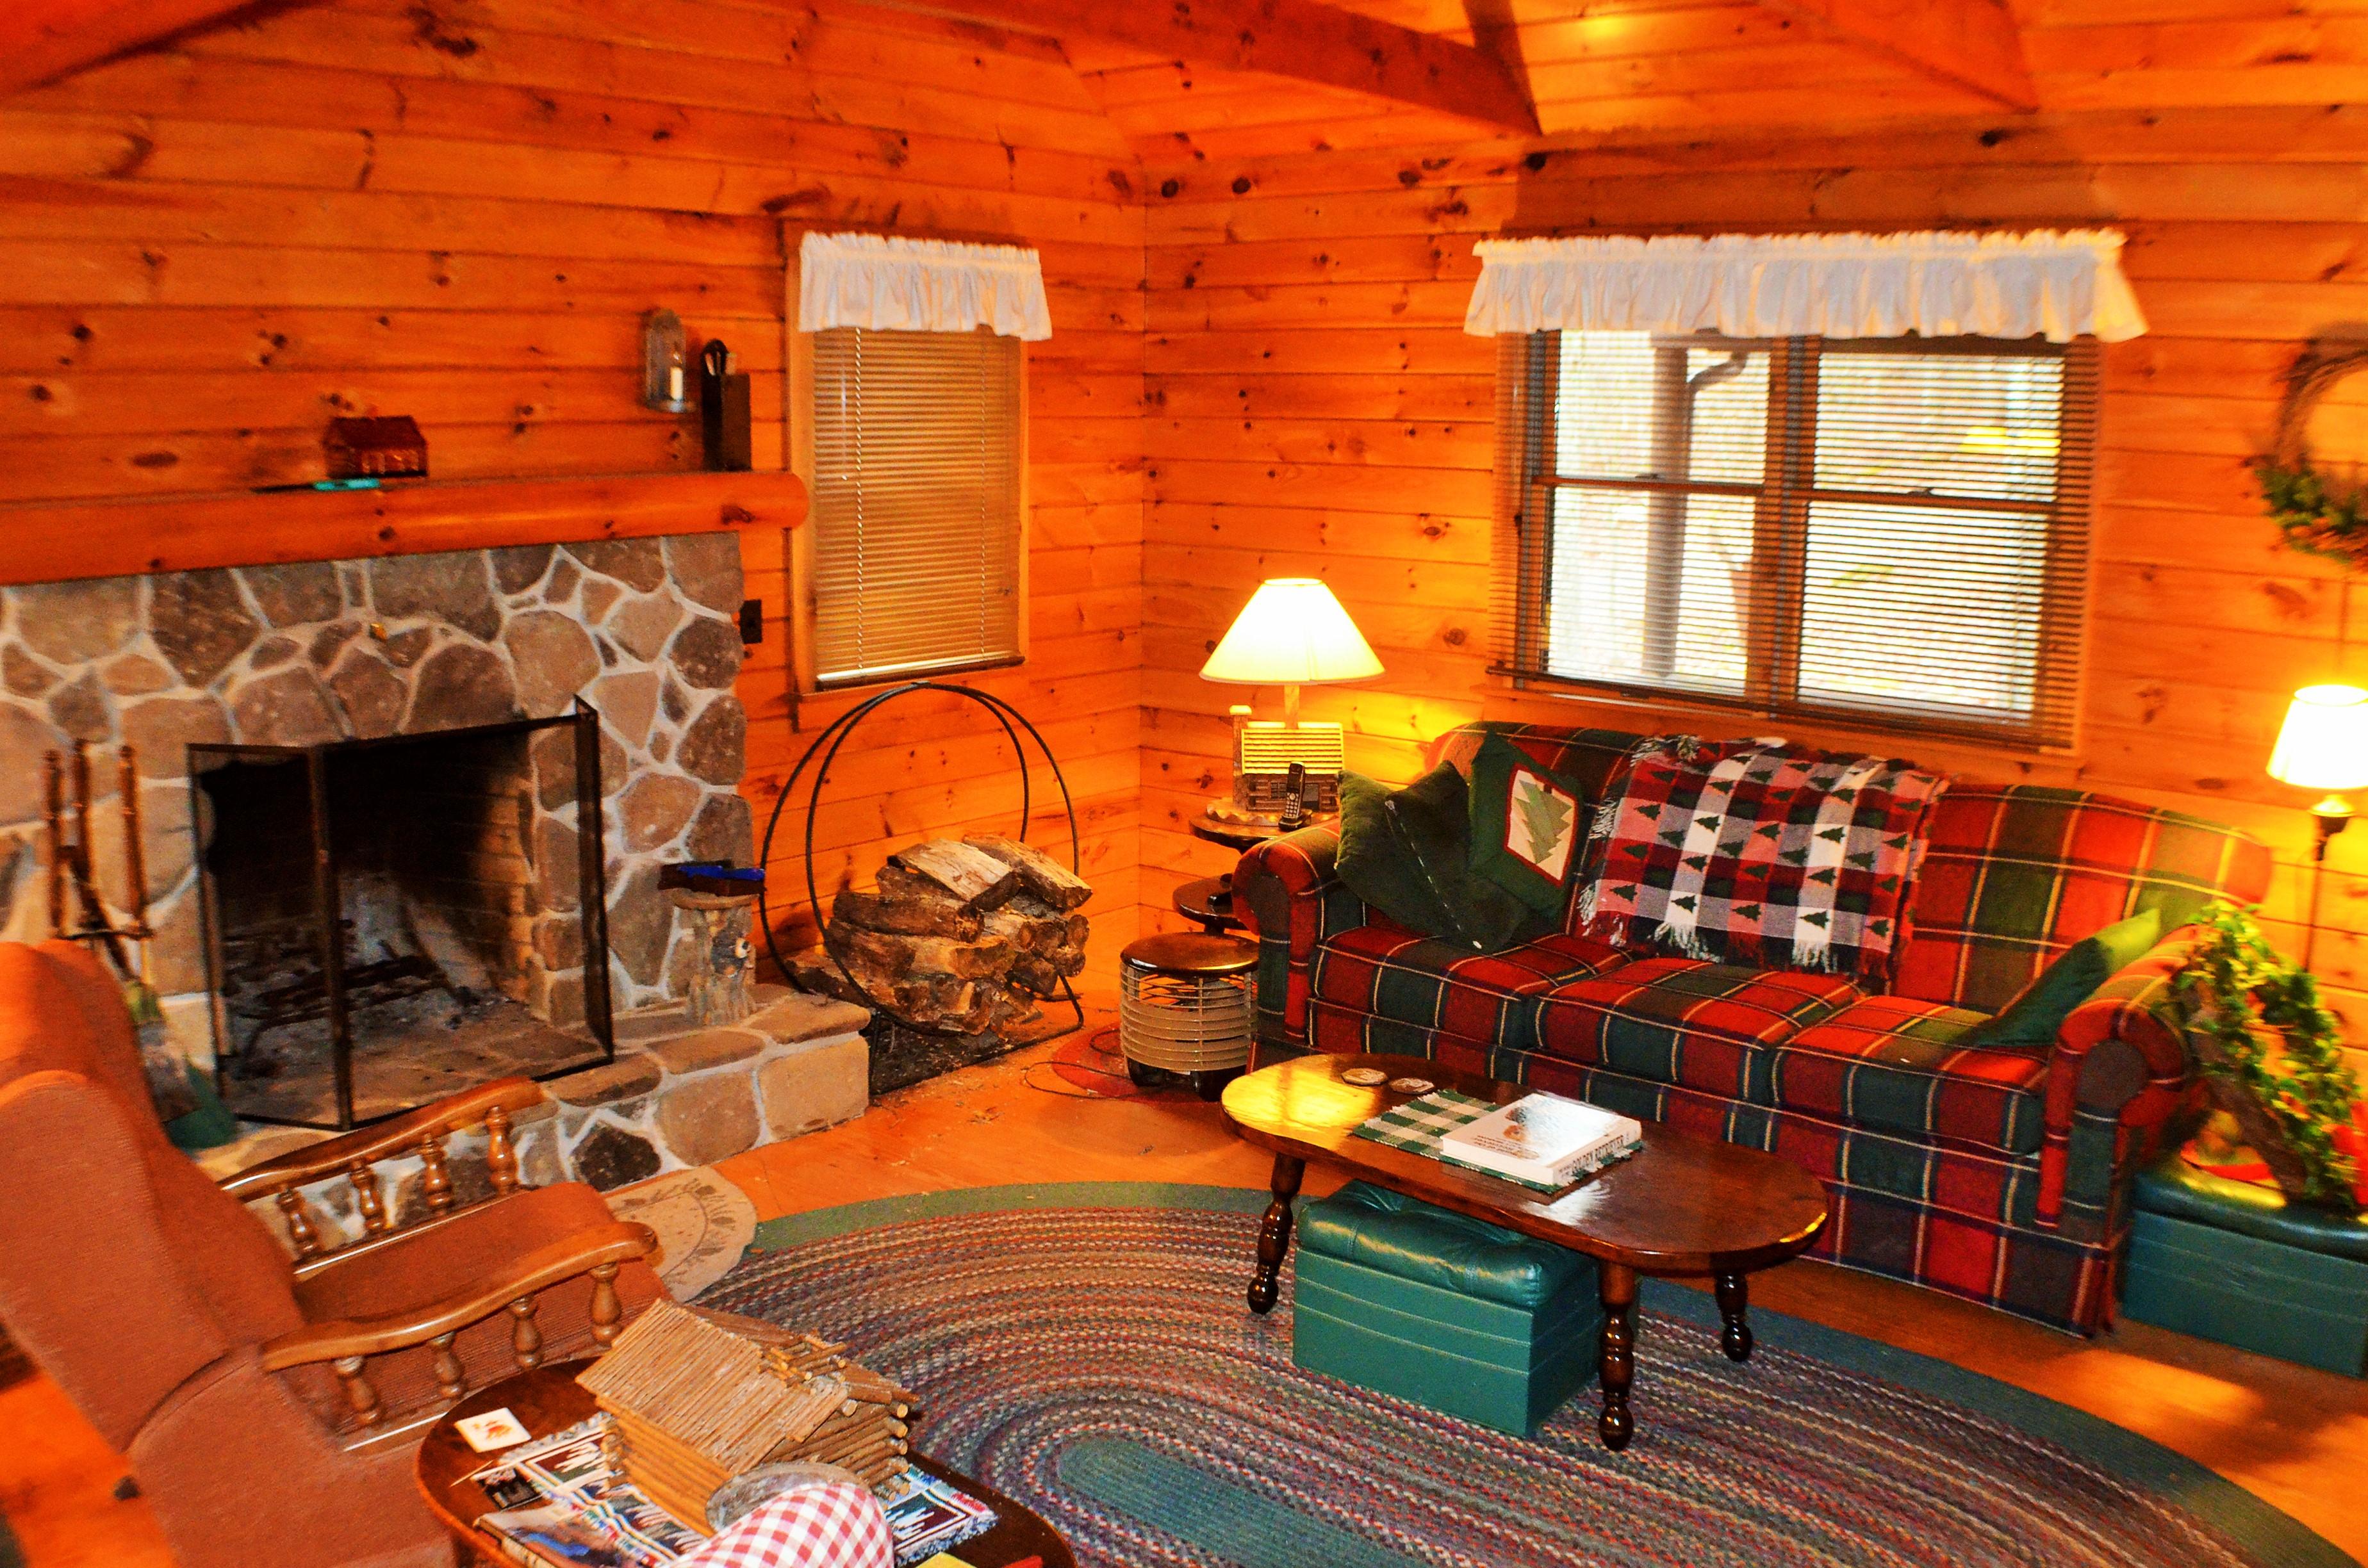 log cabin living room decorating ideas black couch images creekside in the poconos pocono cozy